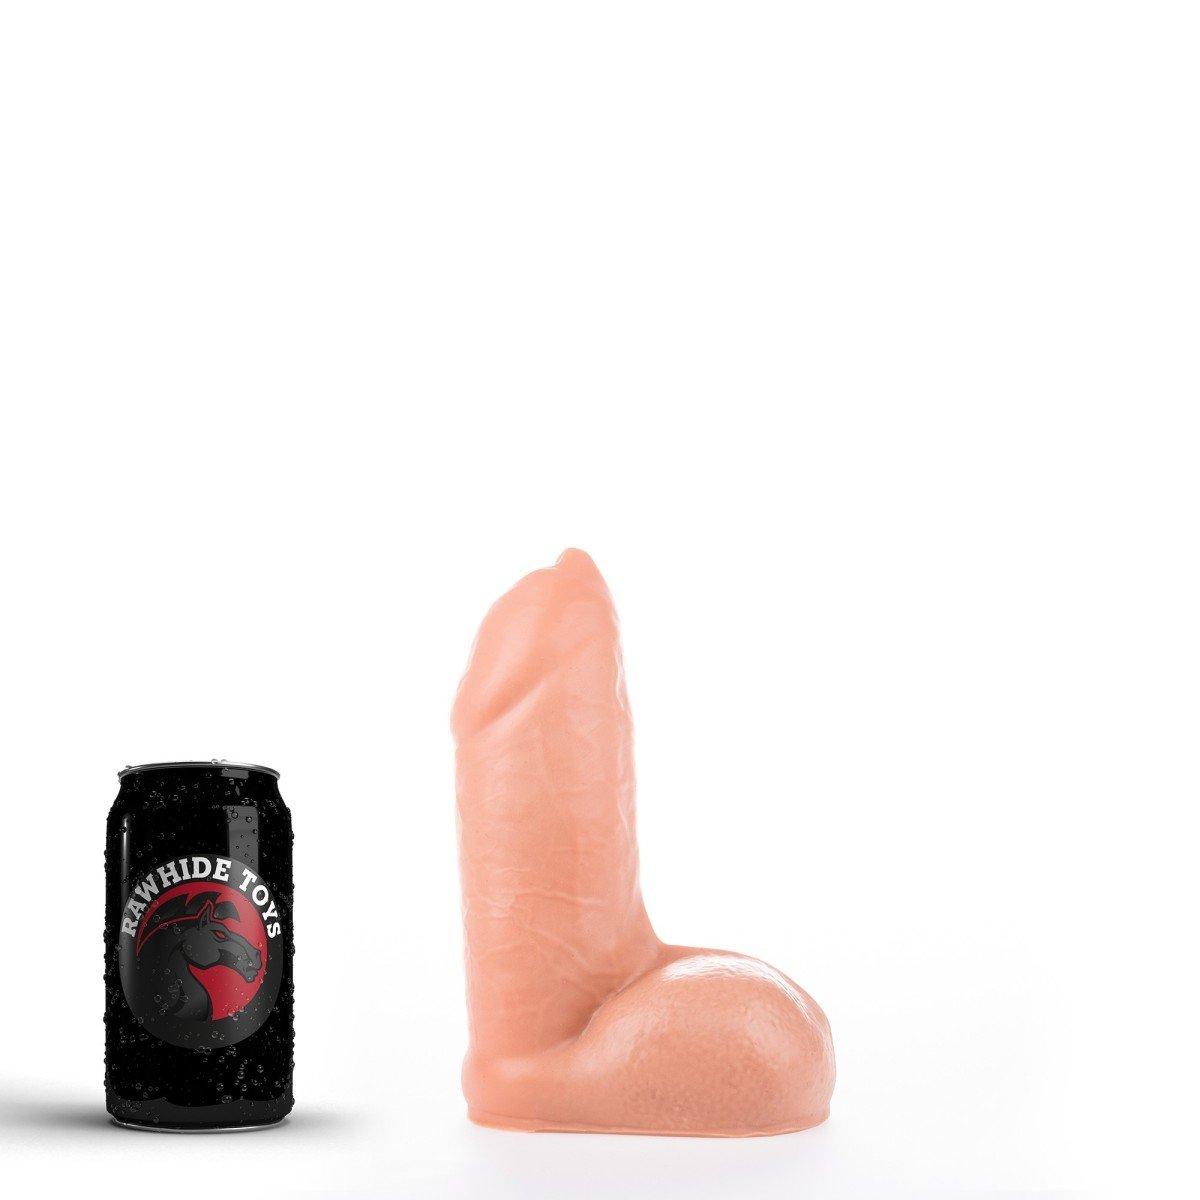 Rawhide Toys Kratos Dildo Small Flesh